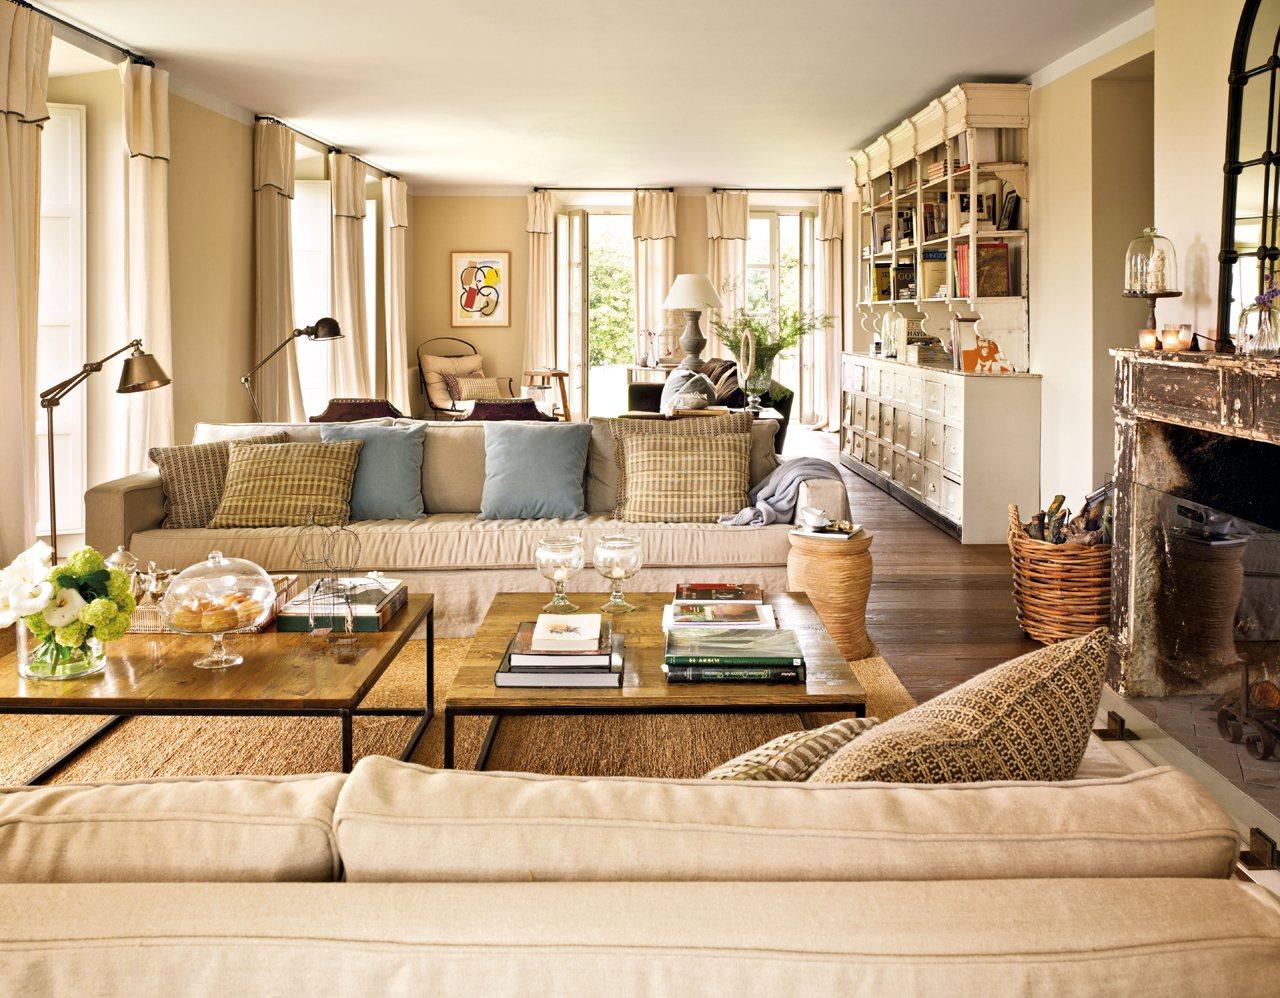 Rehabilitaci n de una casa indiana - El mueble chimeneas ...